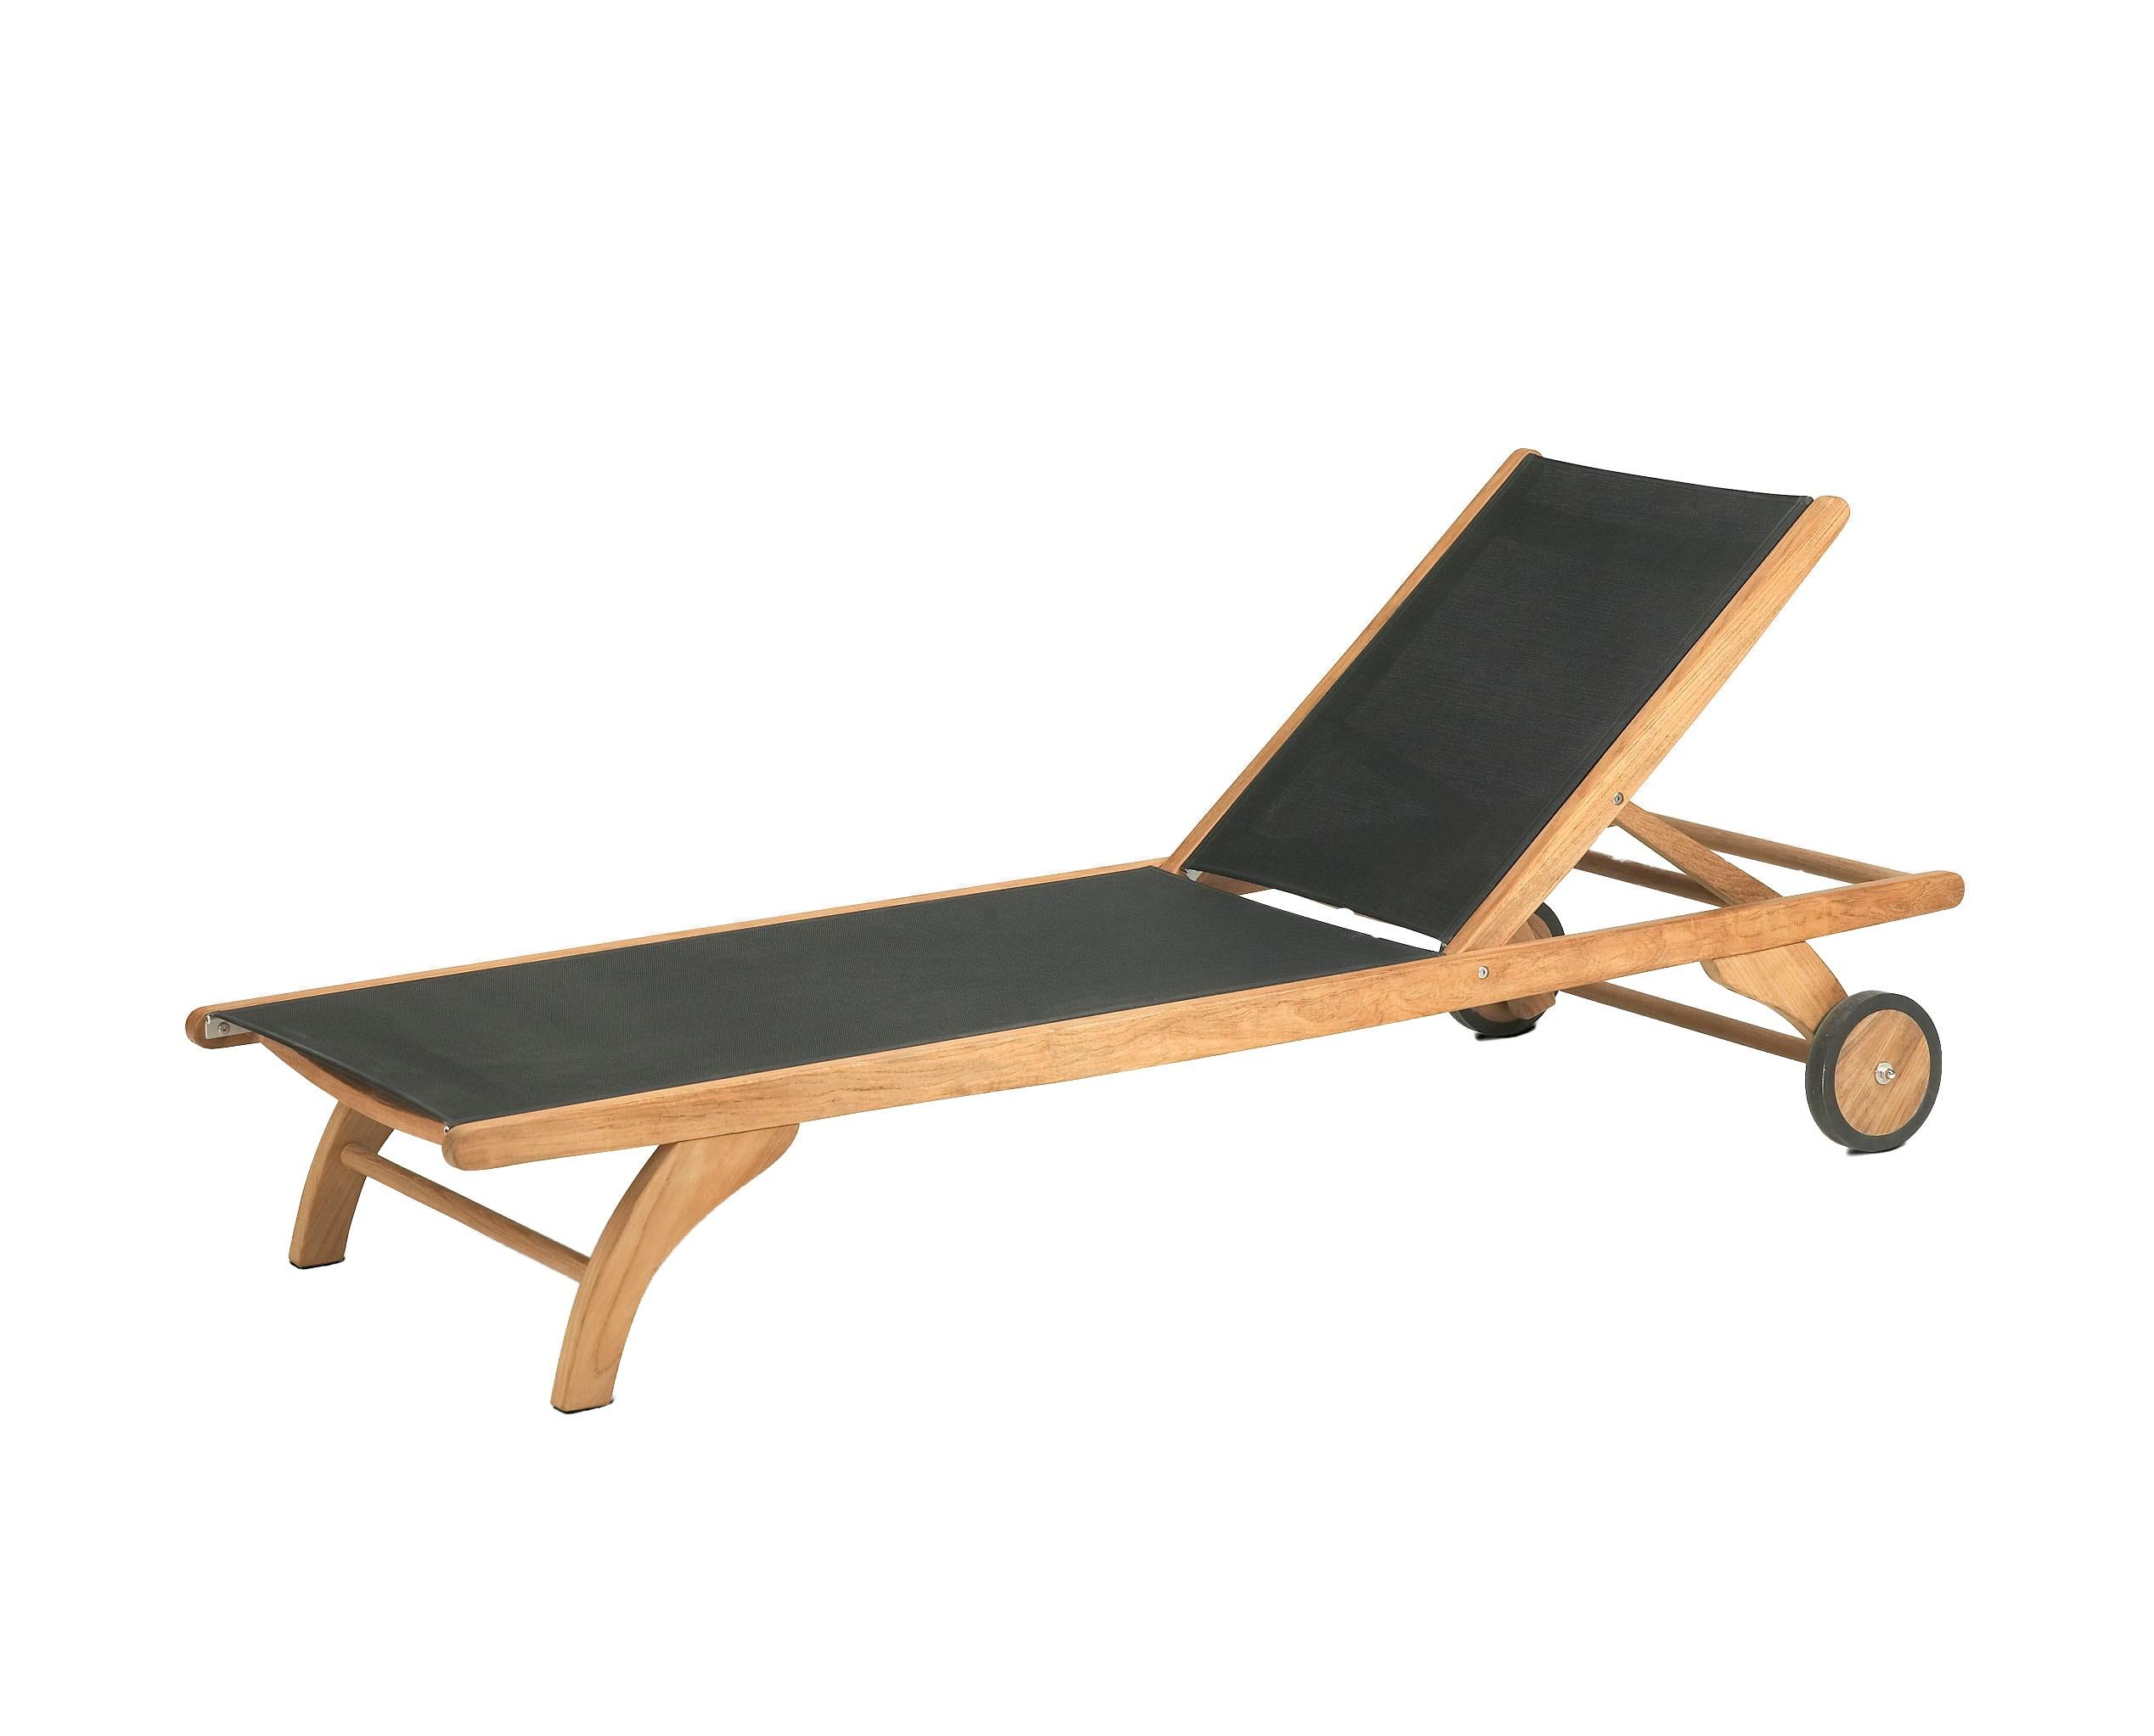 bain de soleil columbus de skagerak noir. Black Bedroom Furniture Sets. Home Design Ideas